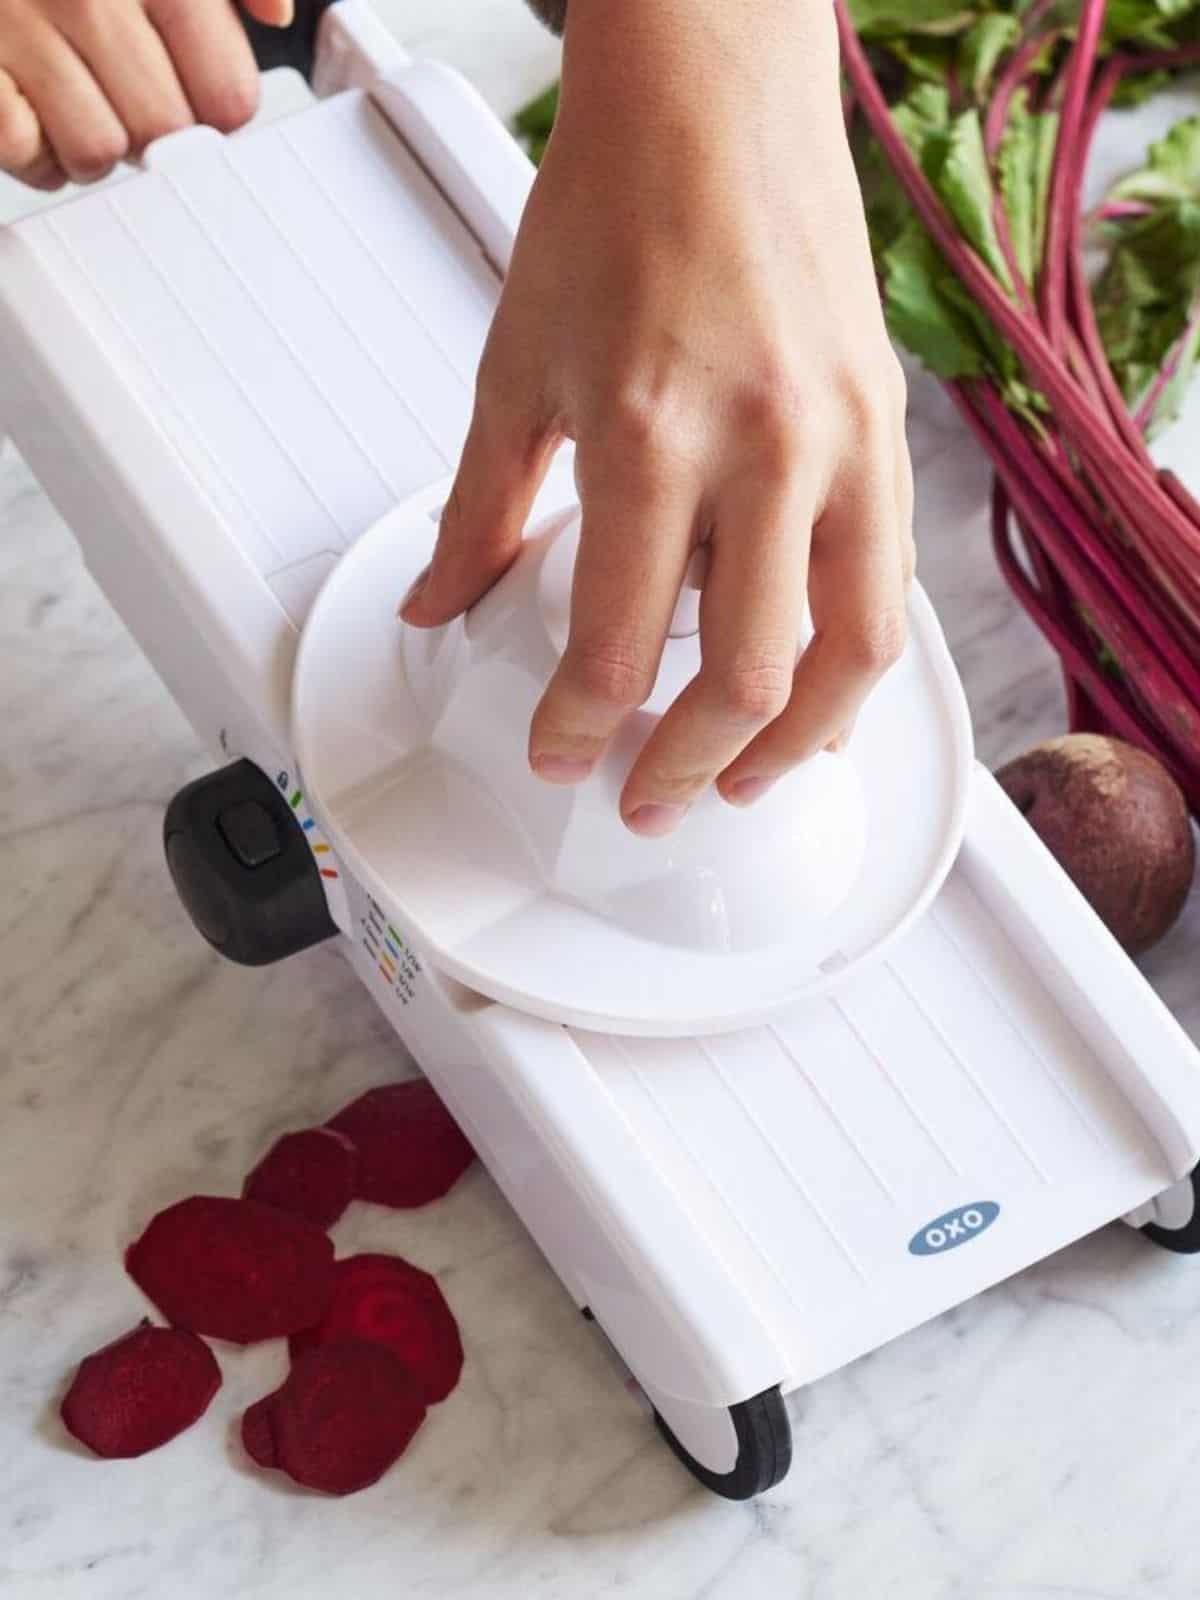 Hands using the best vegetable slicer to slice beets